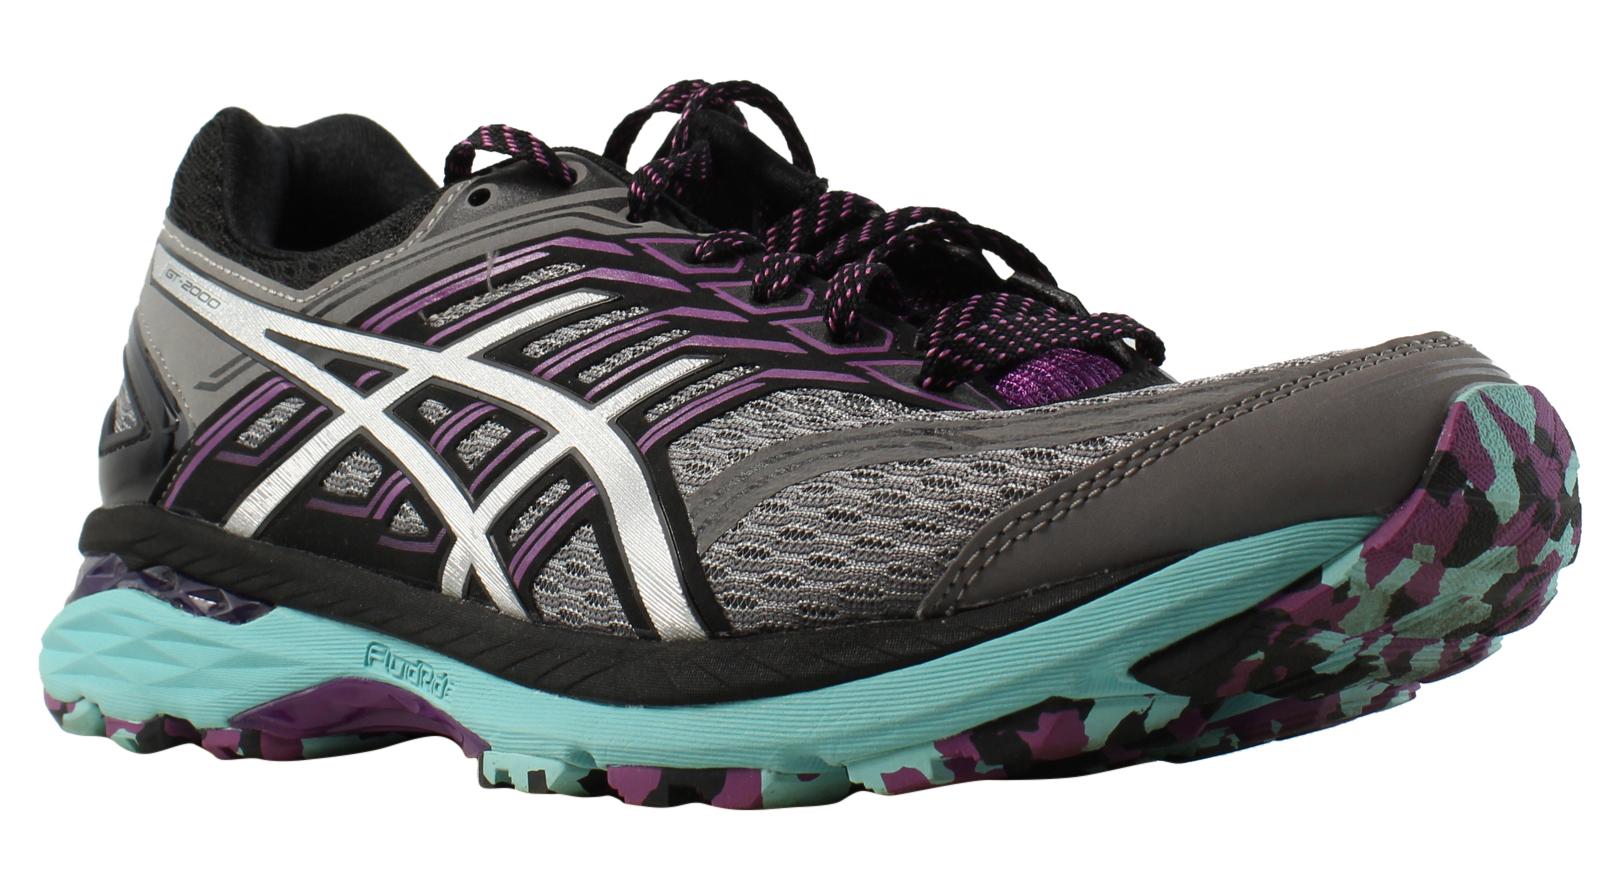 ASICS Damenschuhe Gt-2000 5 Trail Gray Trail Schuhes Größe 9 (352000)